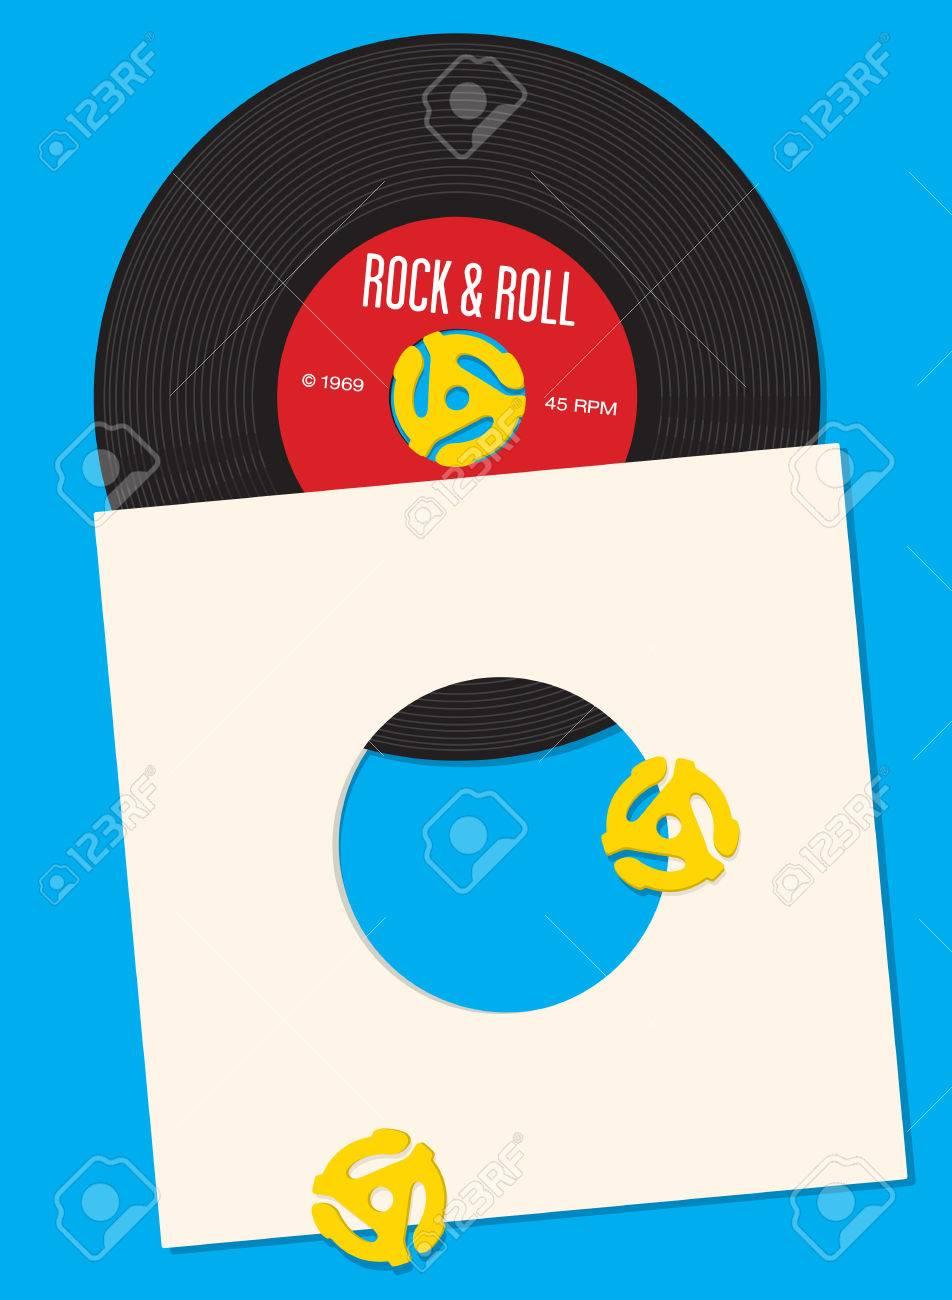 45 Rpm Cliparts Free Download Clip Art.